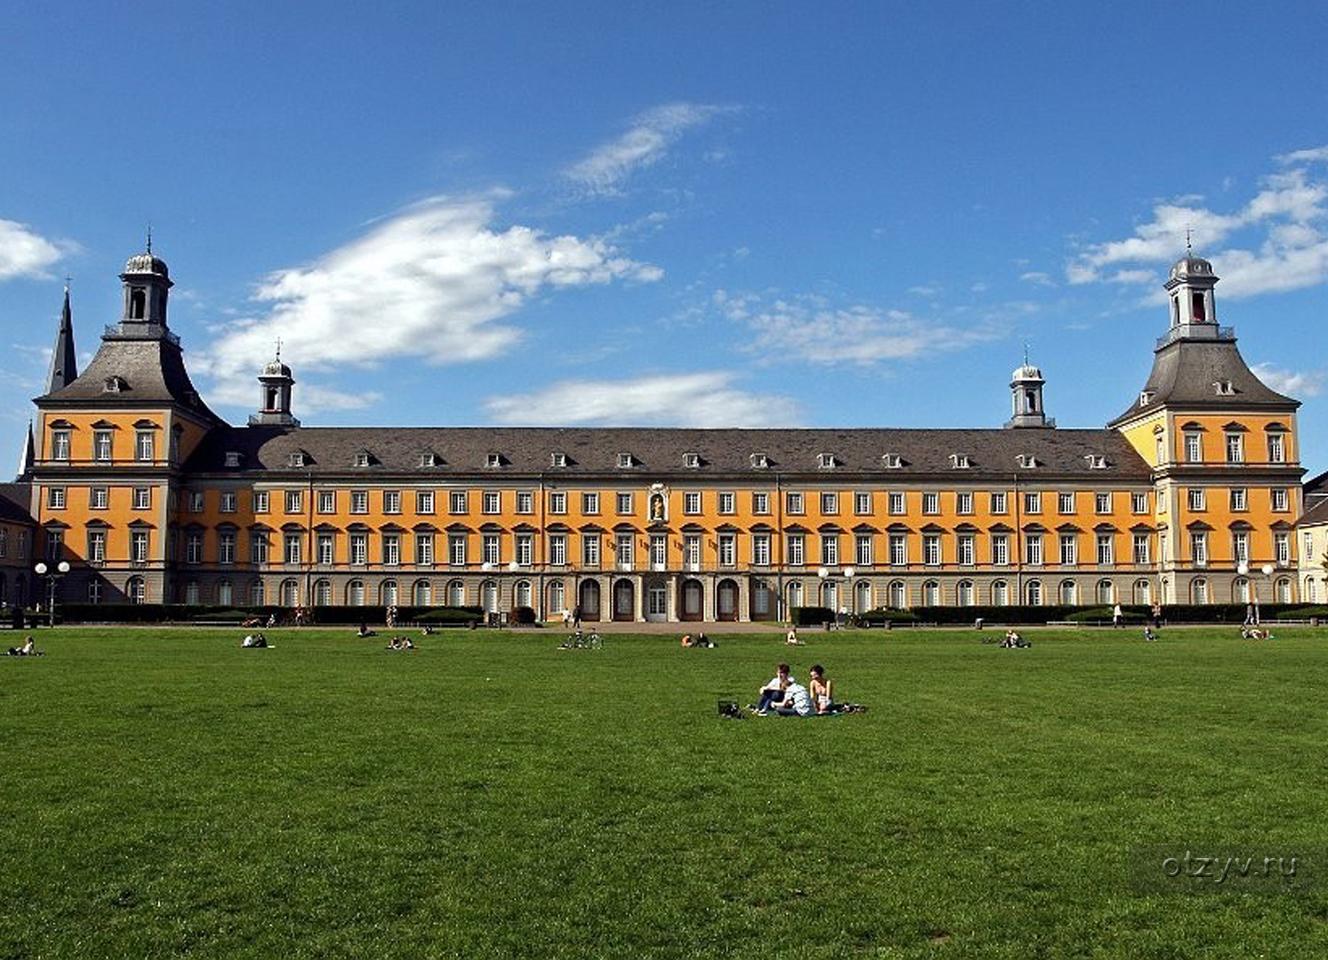 Fotos der universitat bonn